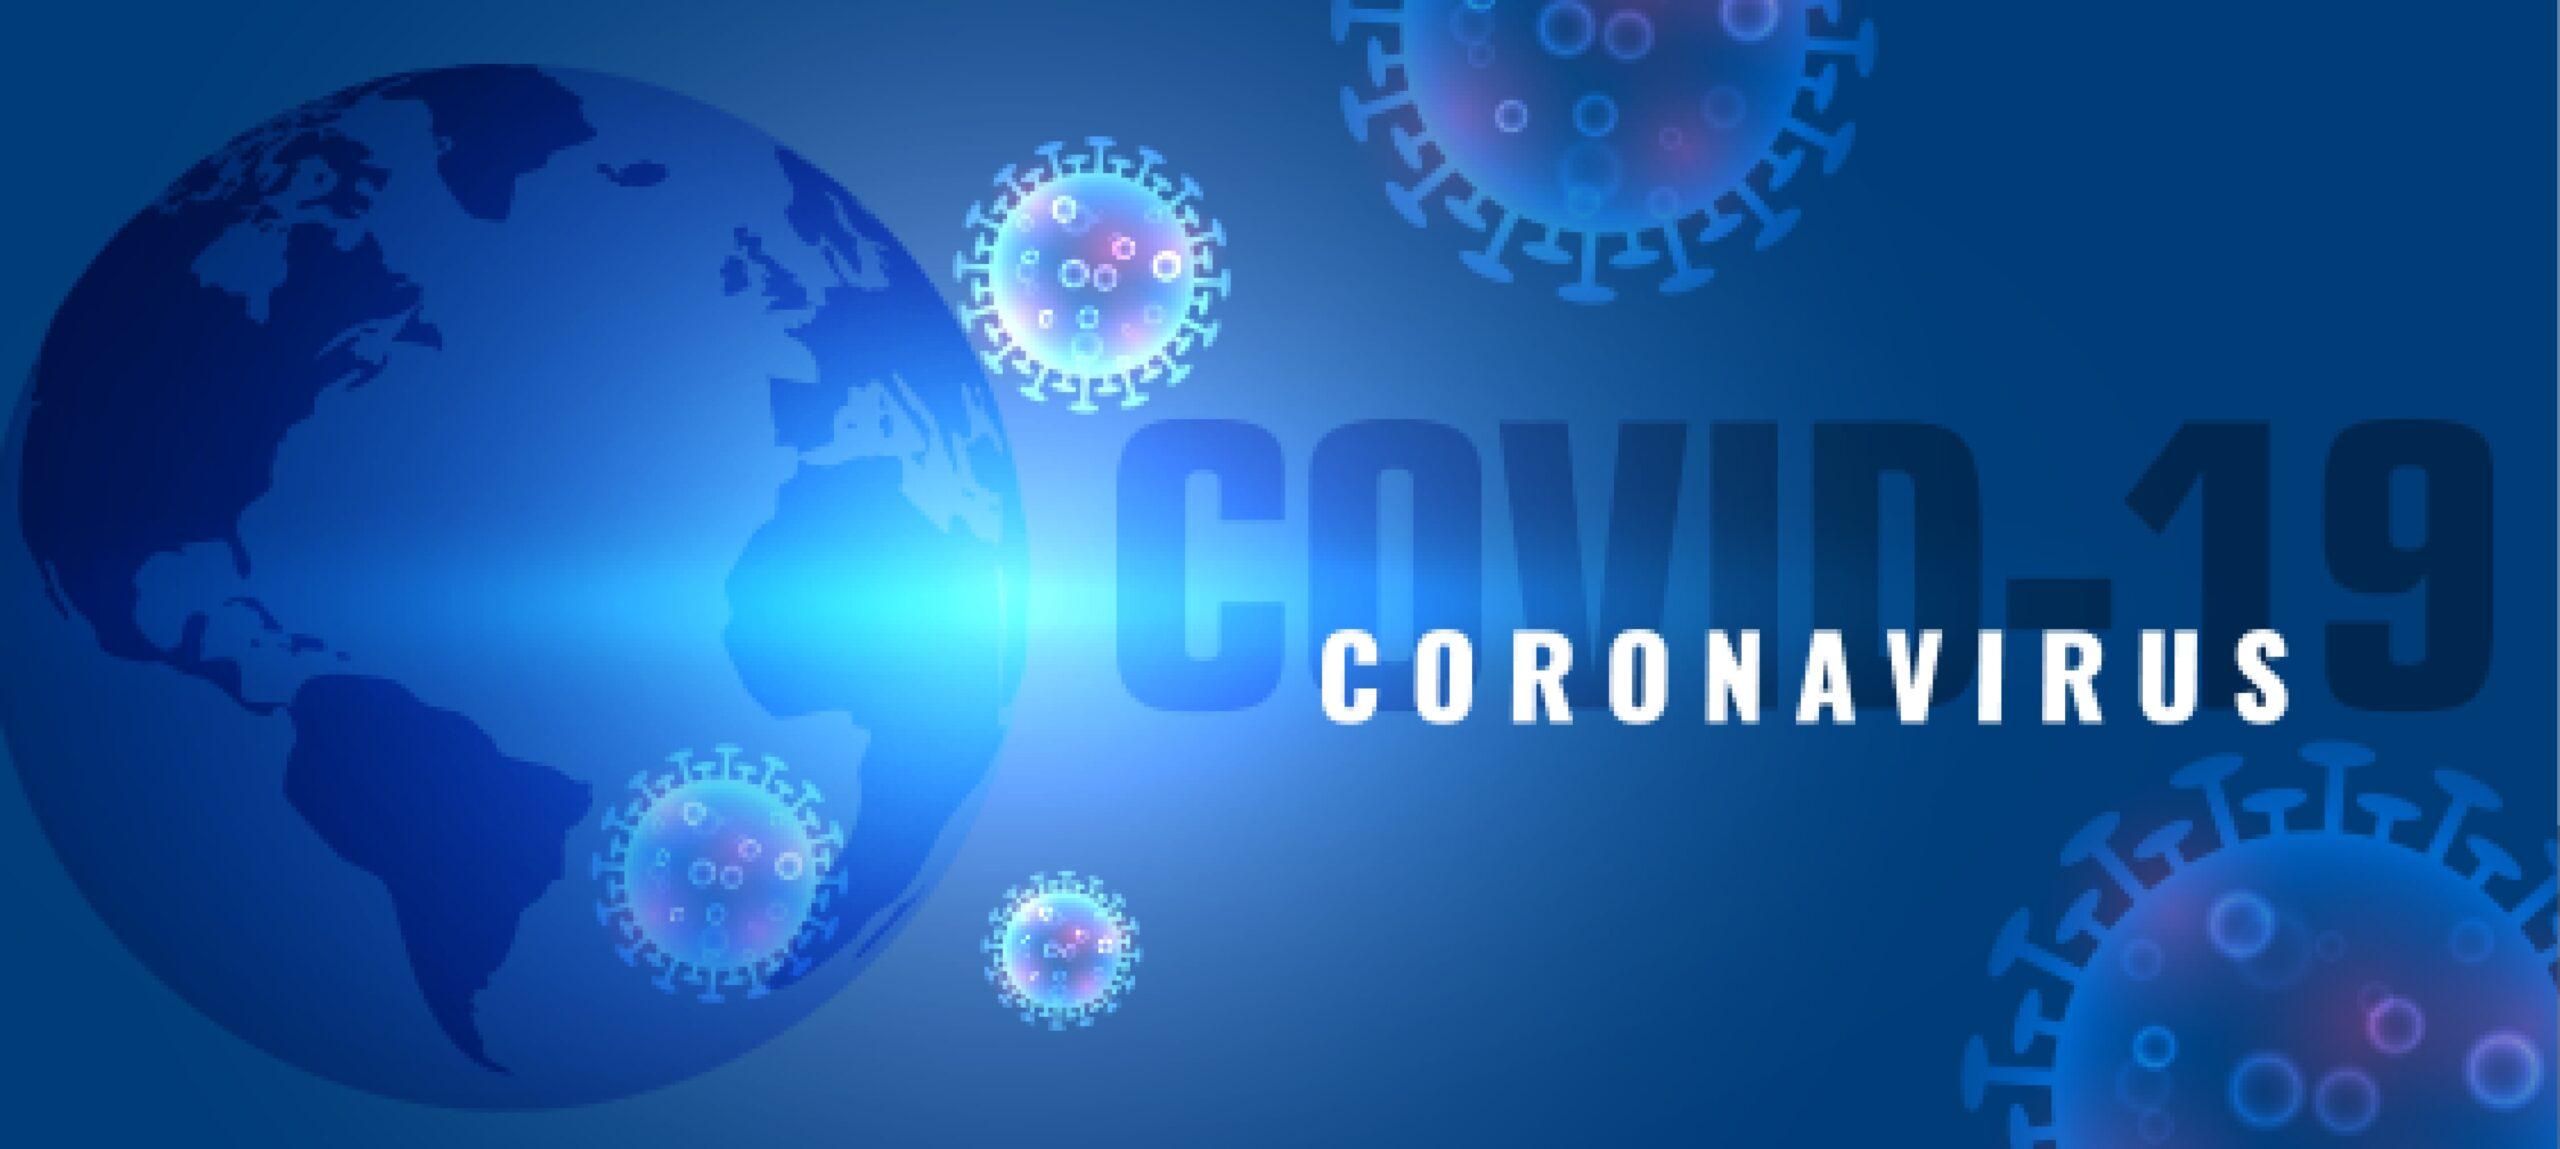 Resized Covid